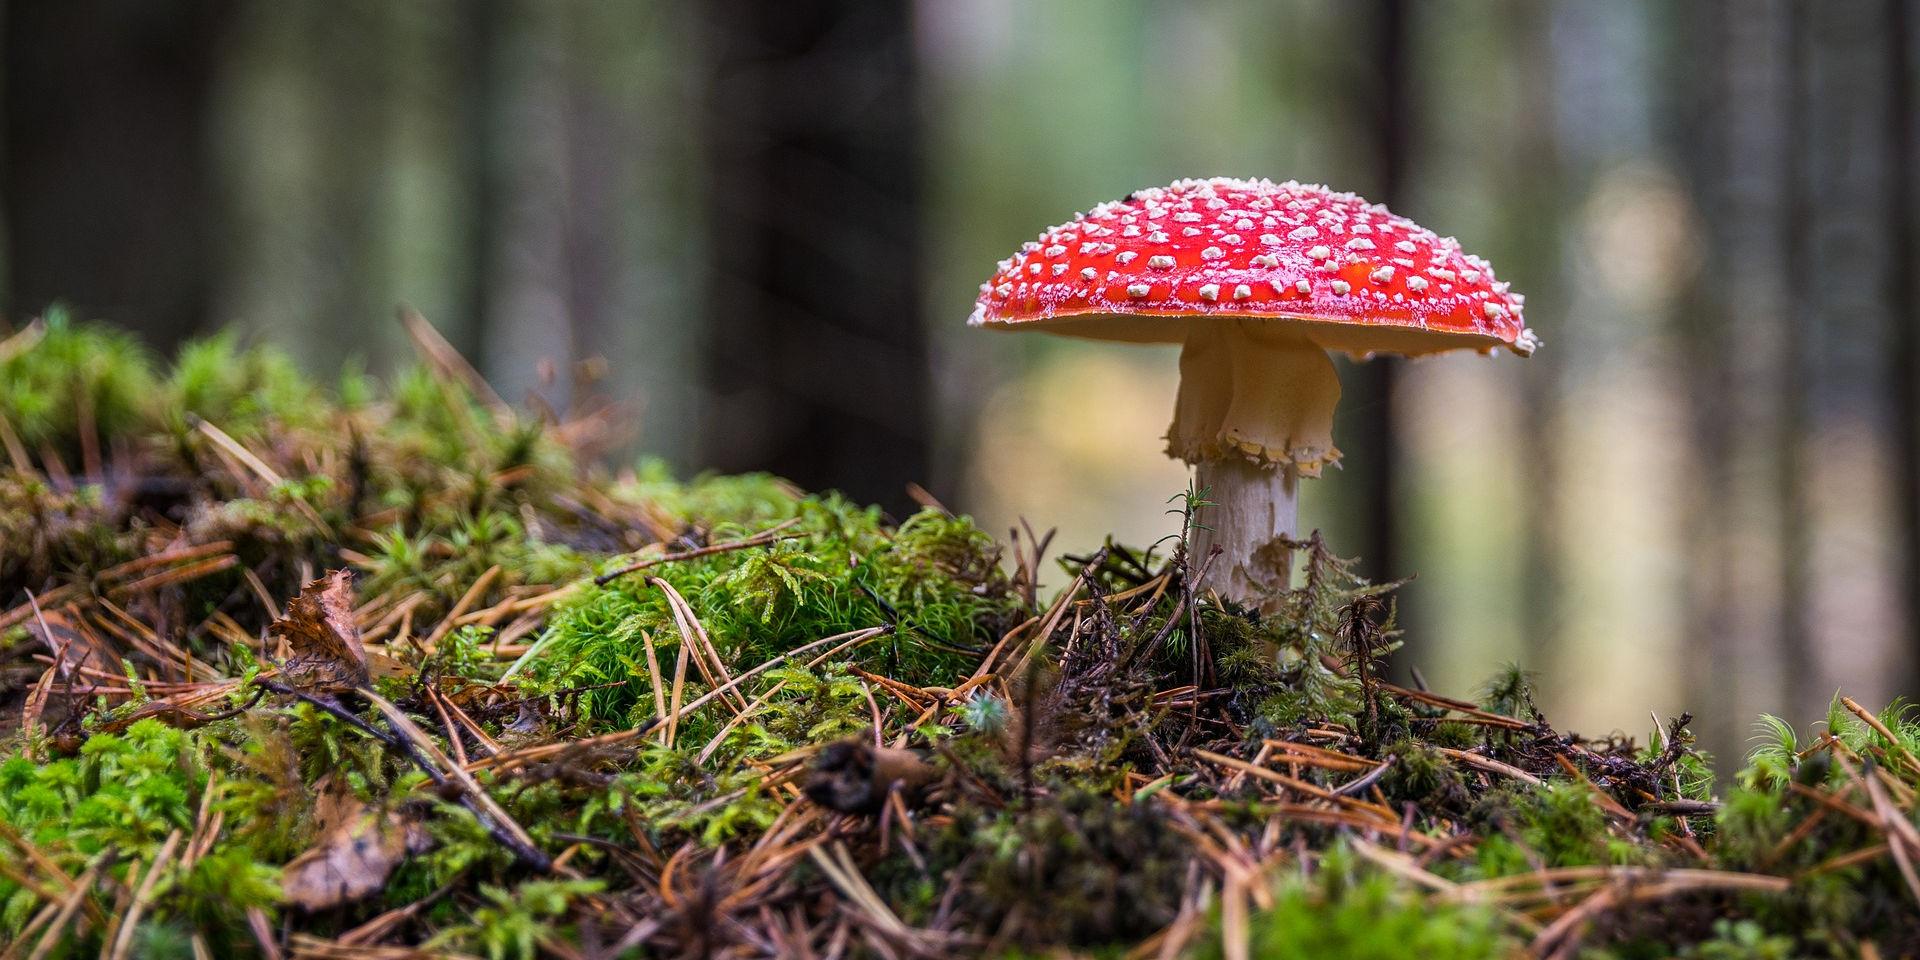 Emerging mushroom. Photo credit: ekamelev on Pixabay.